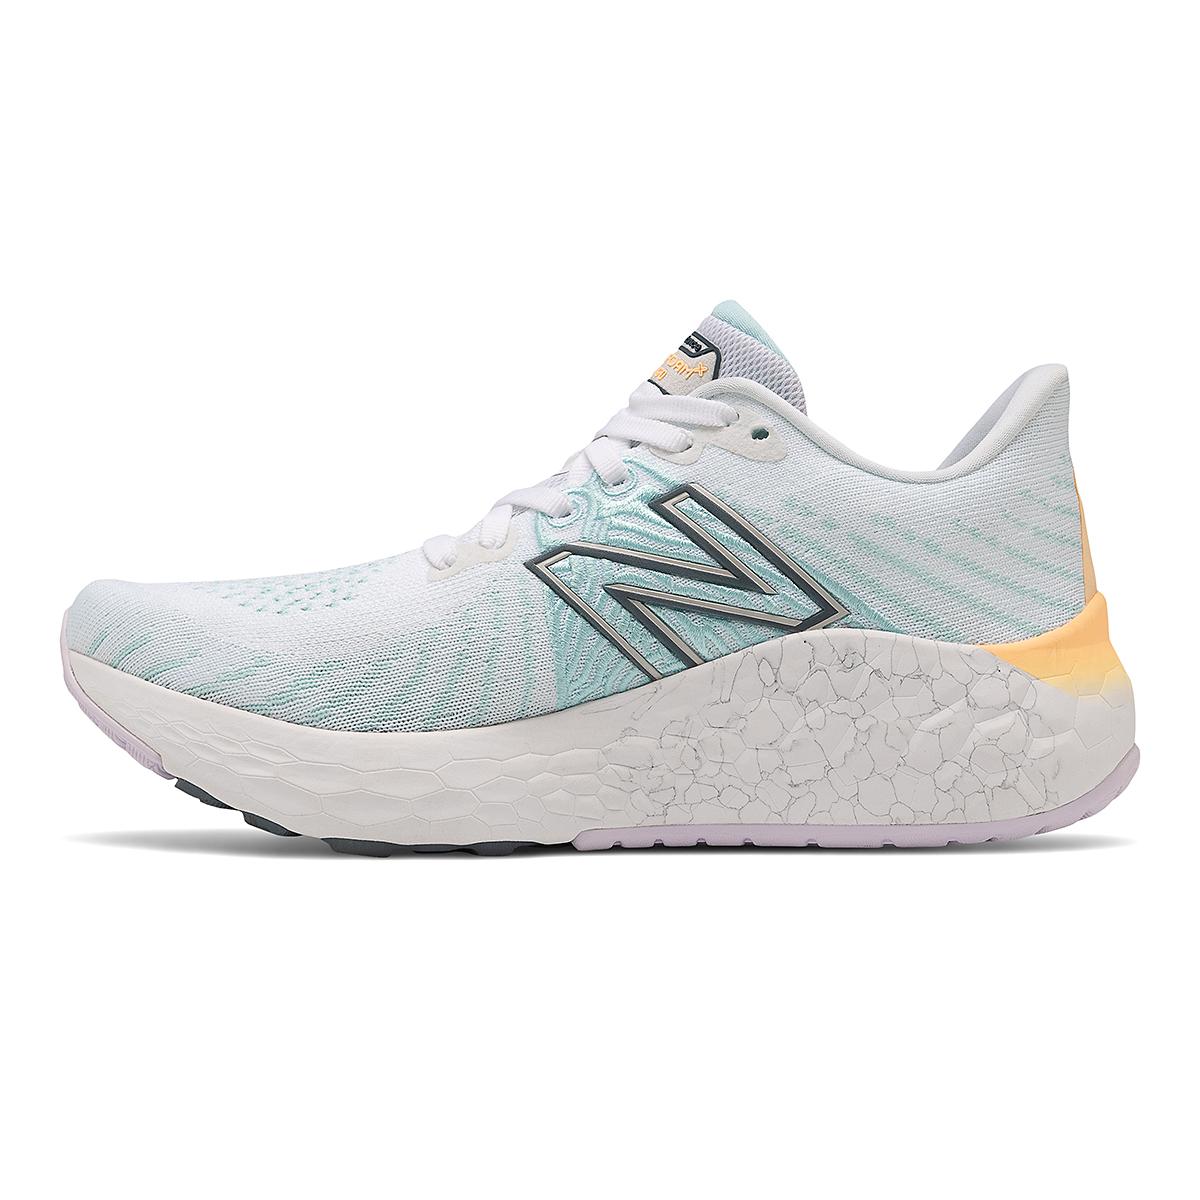 Women's New Balance Fresh Foam Vongo V5 Running Shoe - Color: White/Light Mango - Size: 5 - Width: Regular, White/Light Mango, large, image 2